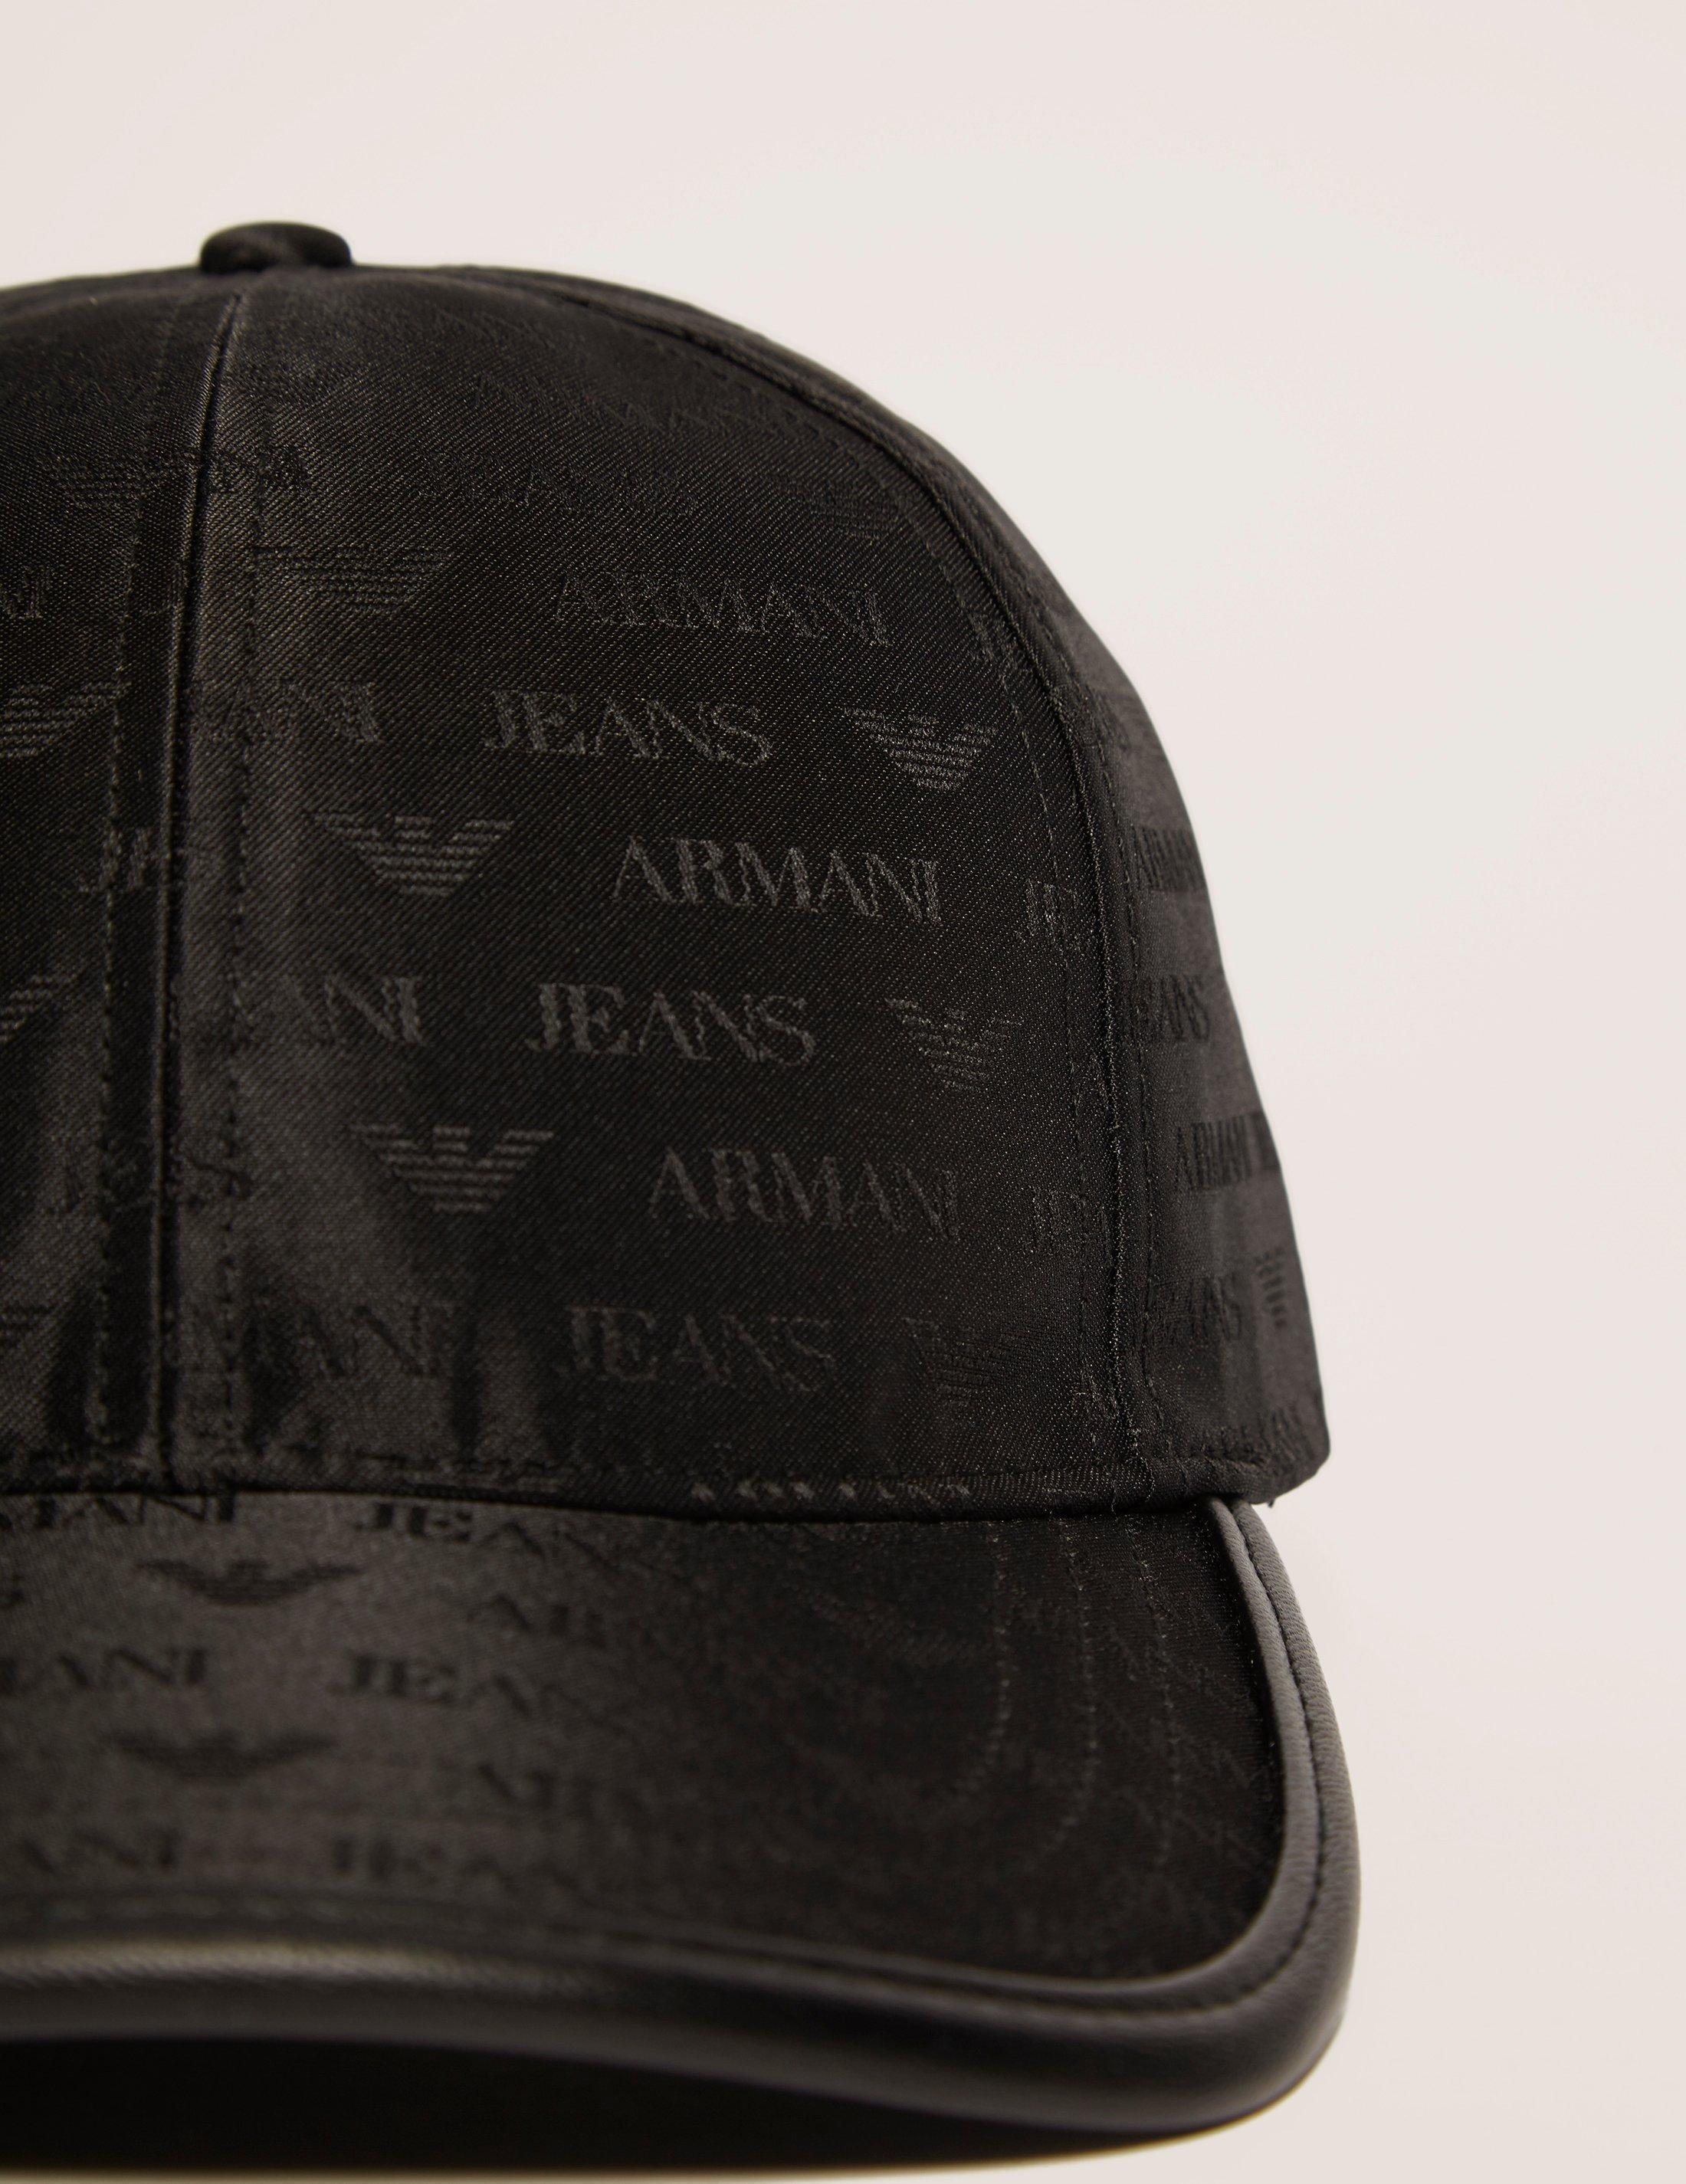 e7921b3762e15 Armani Jeans Nylon Print Cap in Black for Men - Lyst